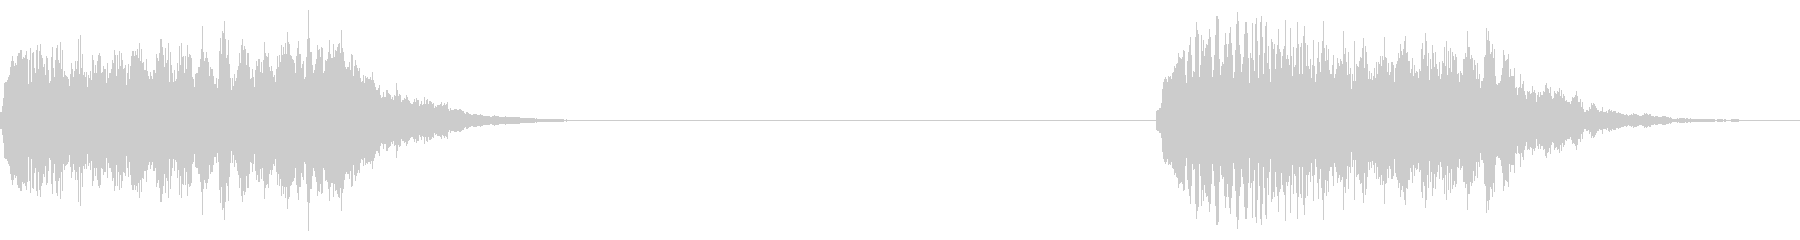 RISING CHIME SCAL...の未再生の波形